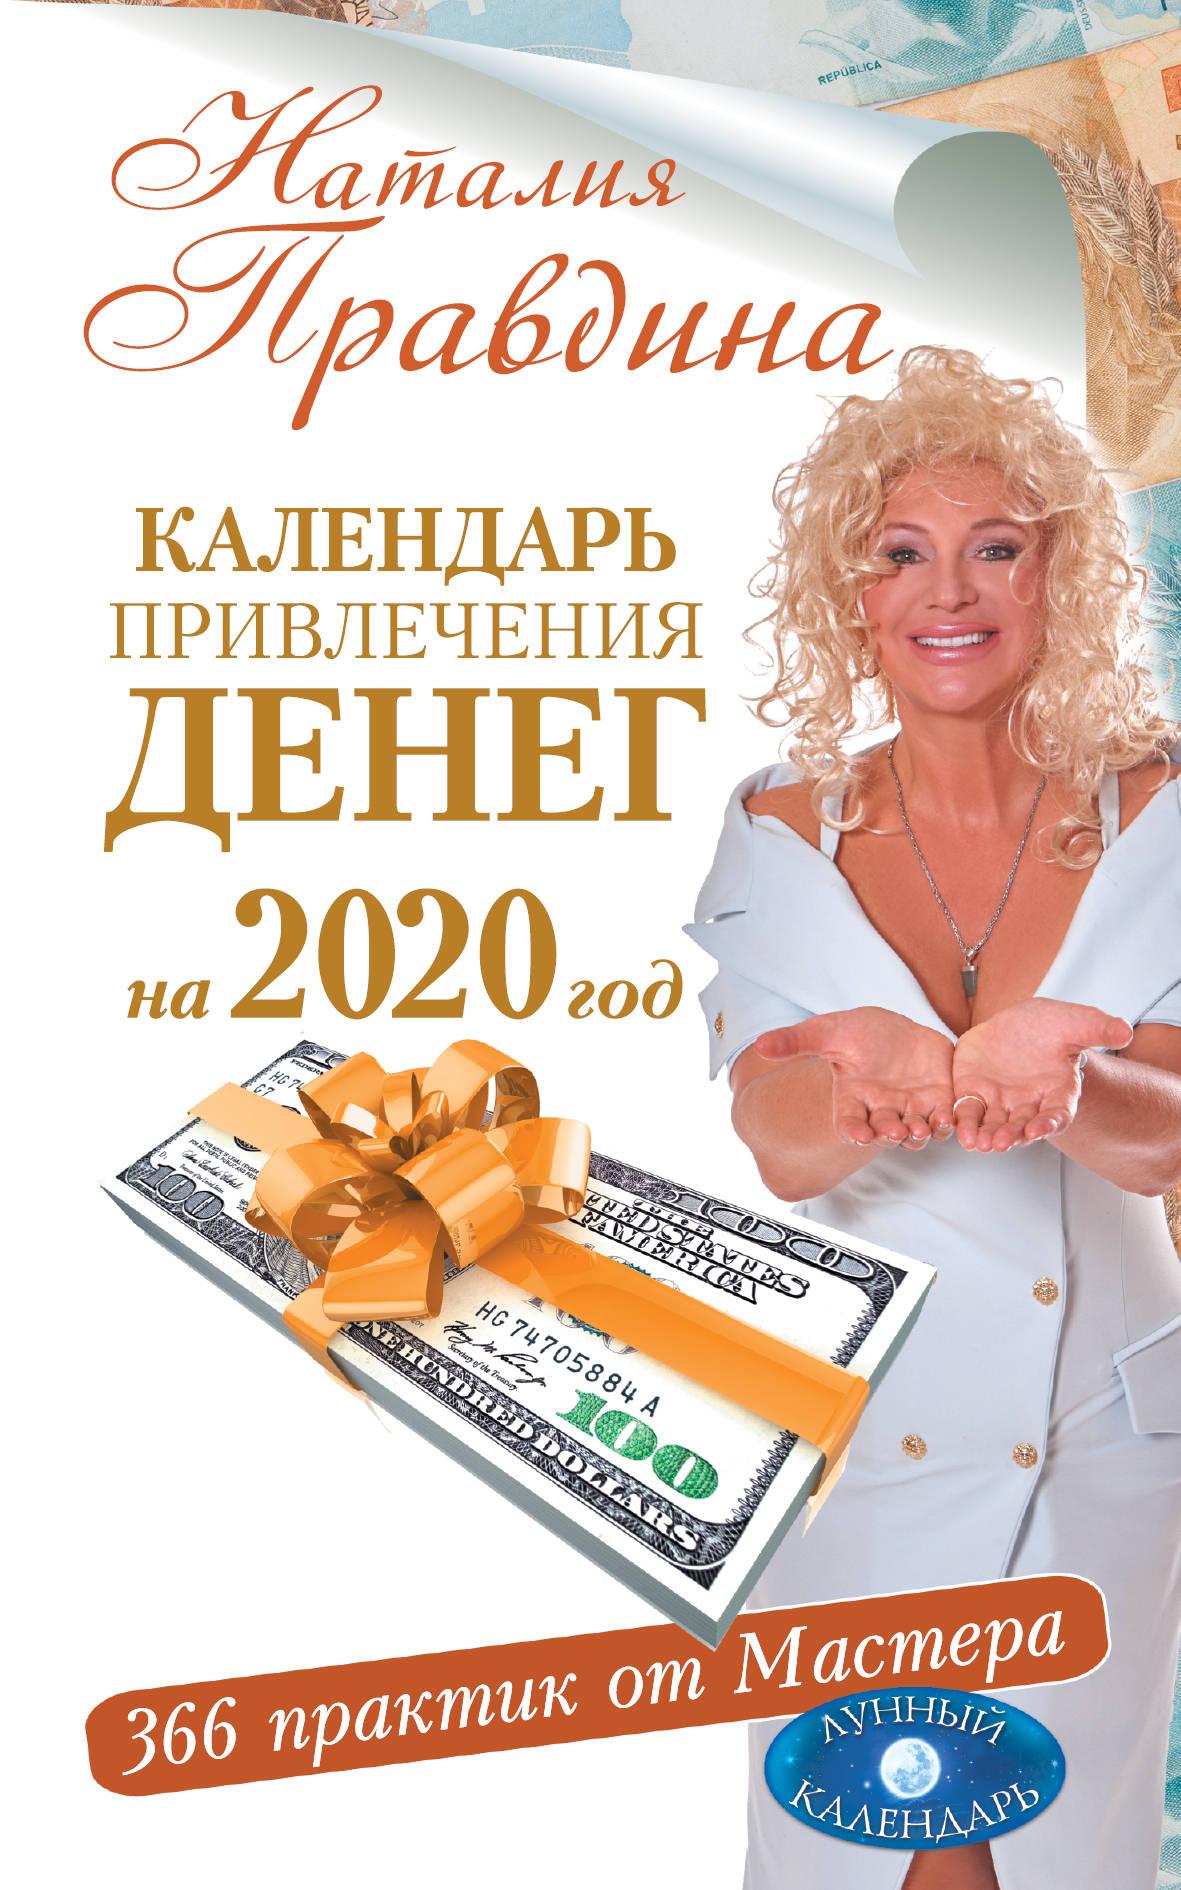 Kalendar privlechenija deneg na 2020 god. 366 praktik ot Mastera. Lunnyj kalendar